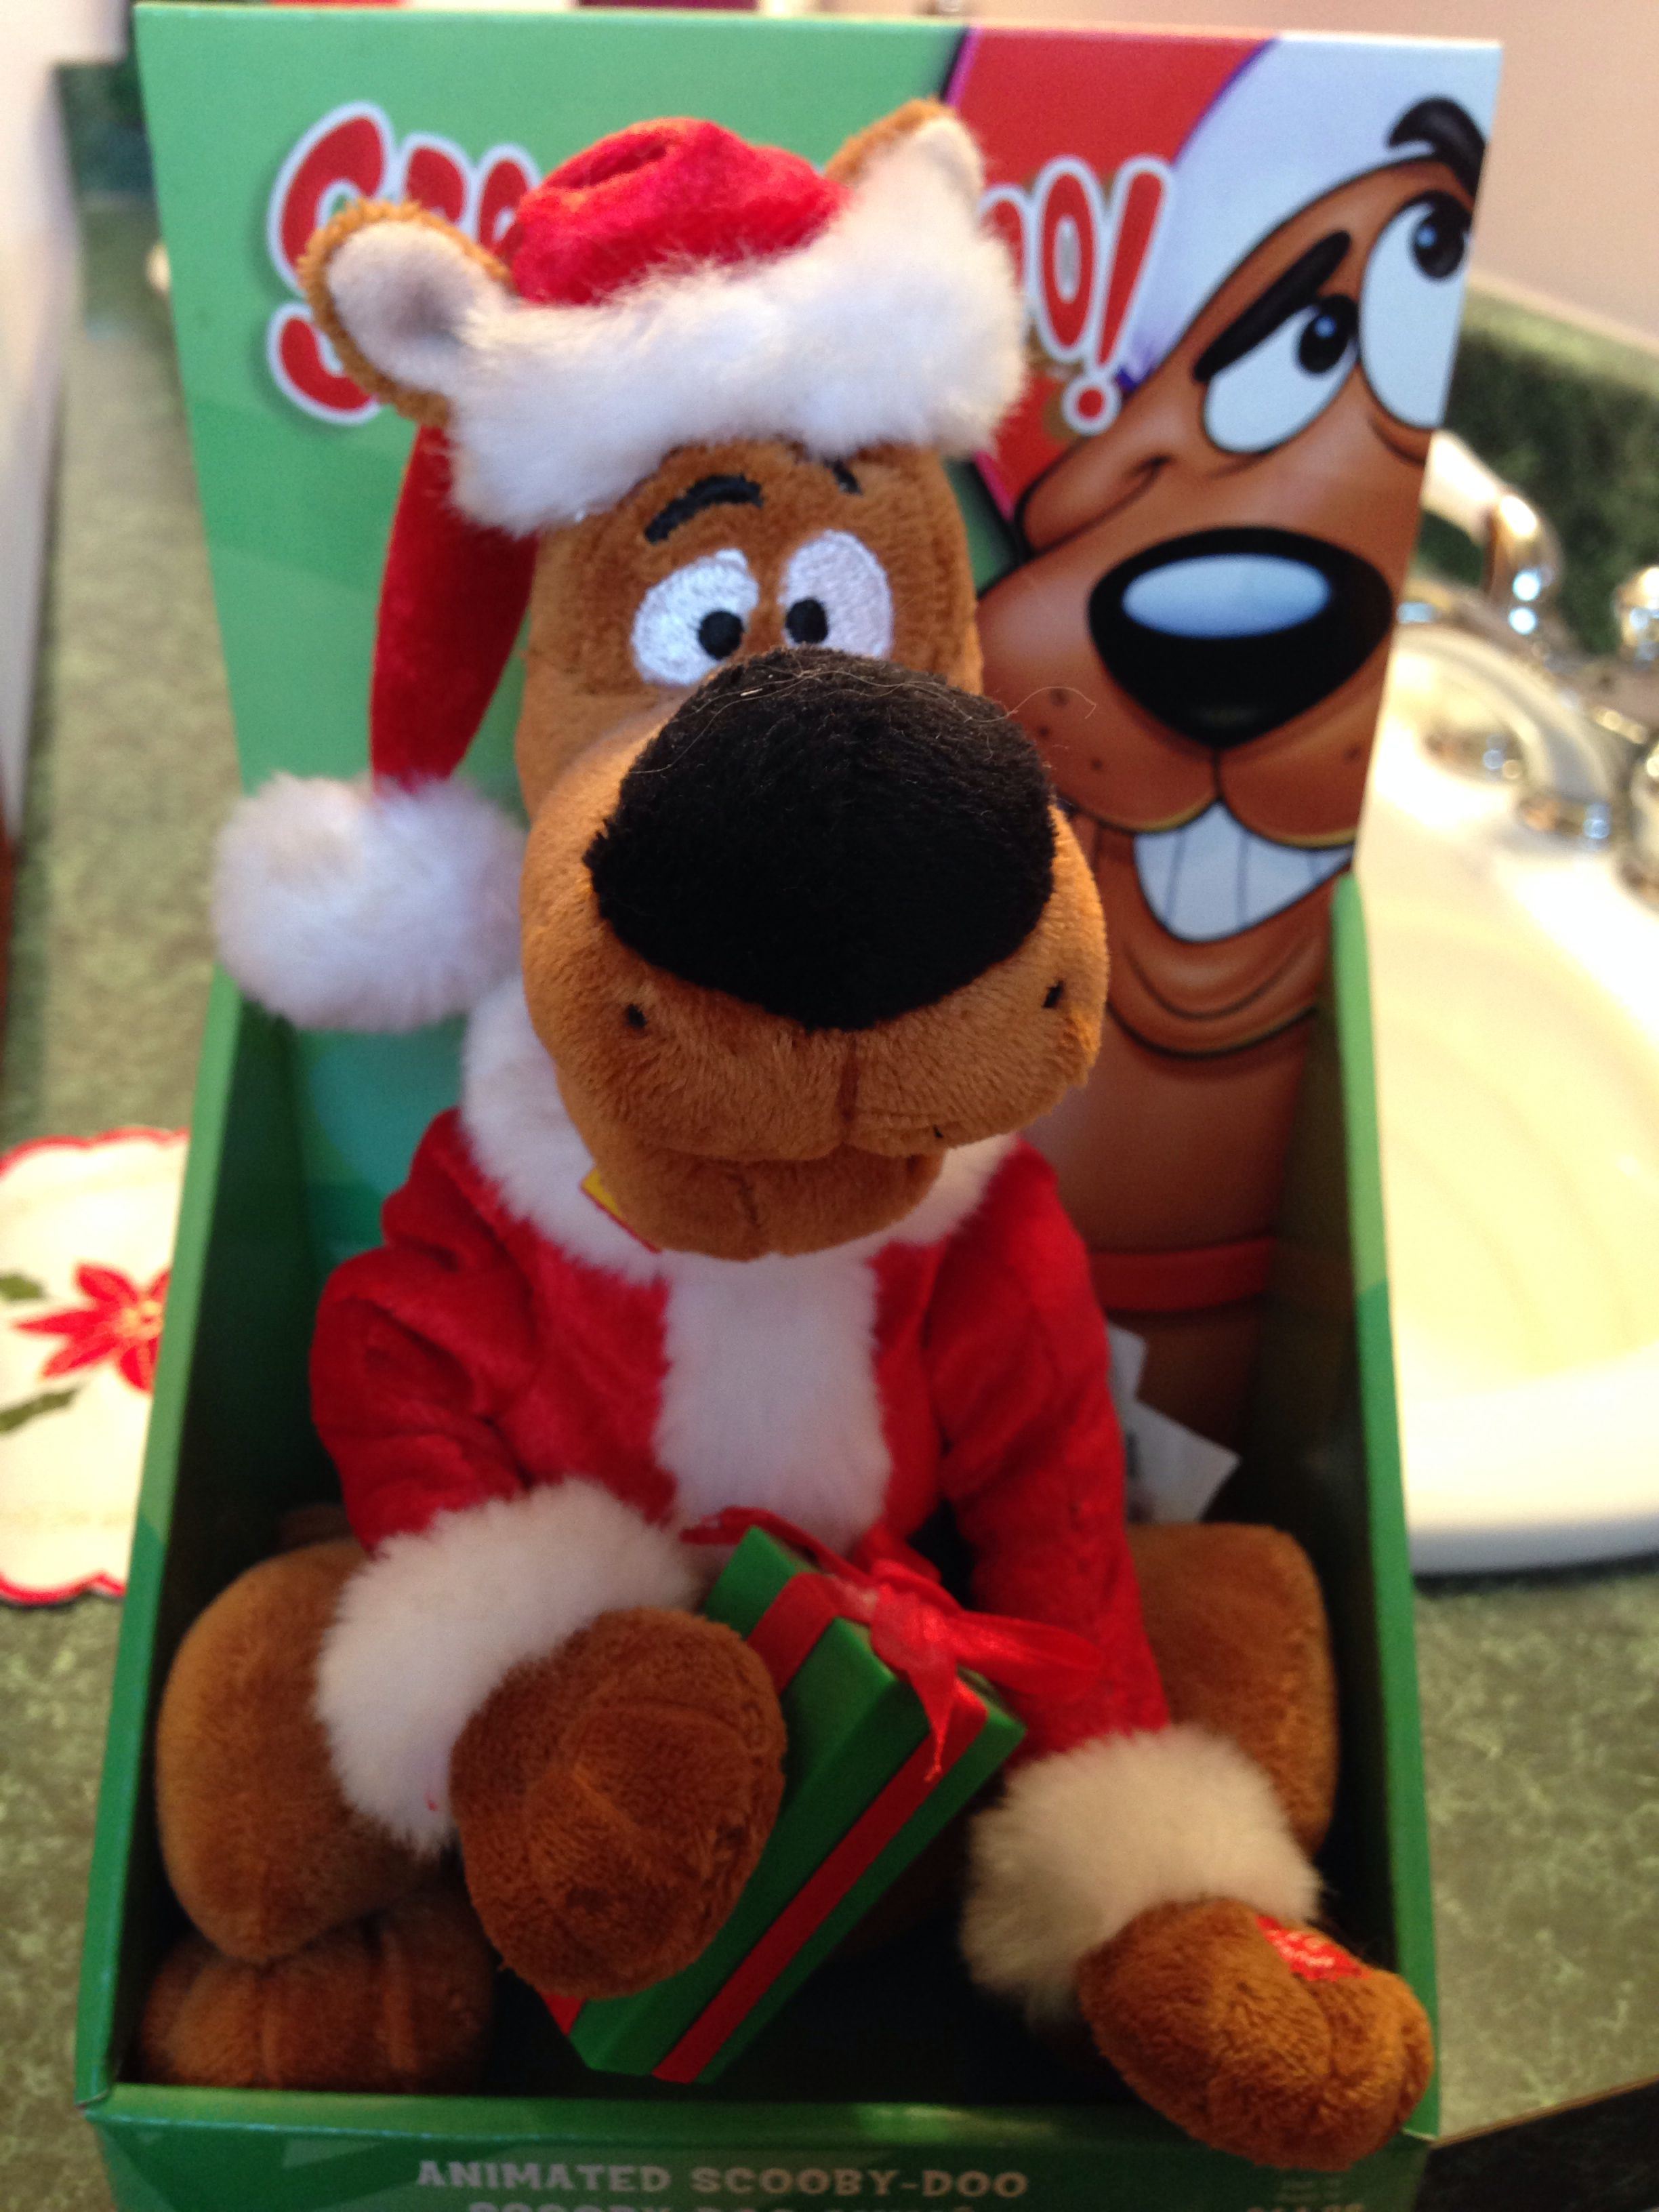 My husbands Scooby Doo I gave him for christmas. | Winter wonderland ...